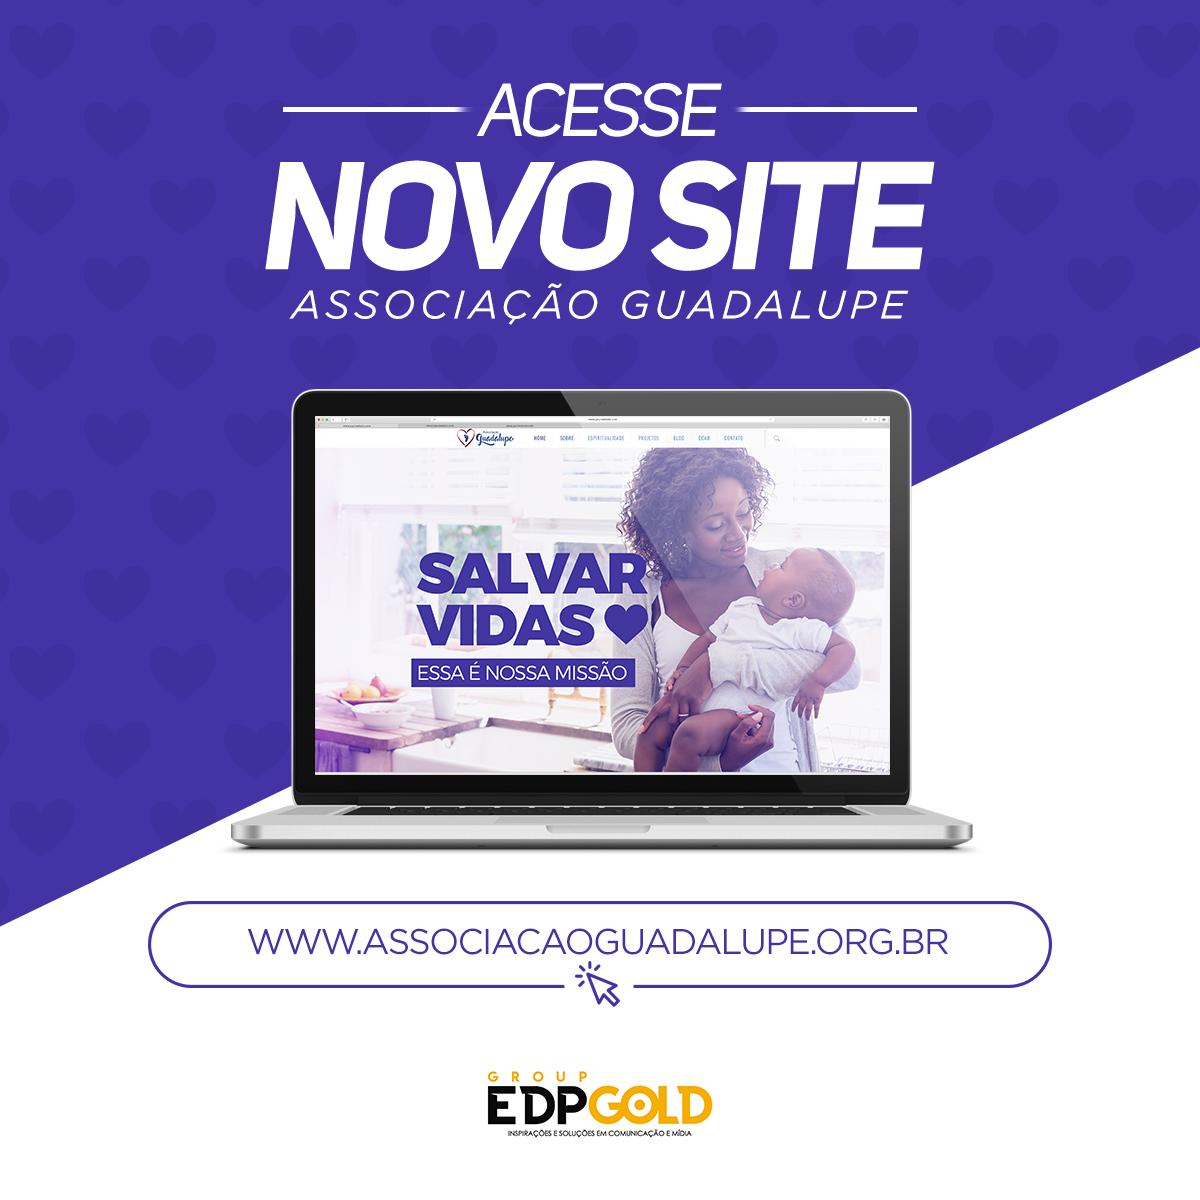 site-associacao-guadalupe-defesa-da-vida-edp-gold-i3s